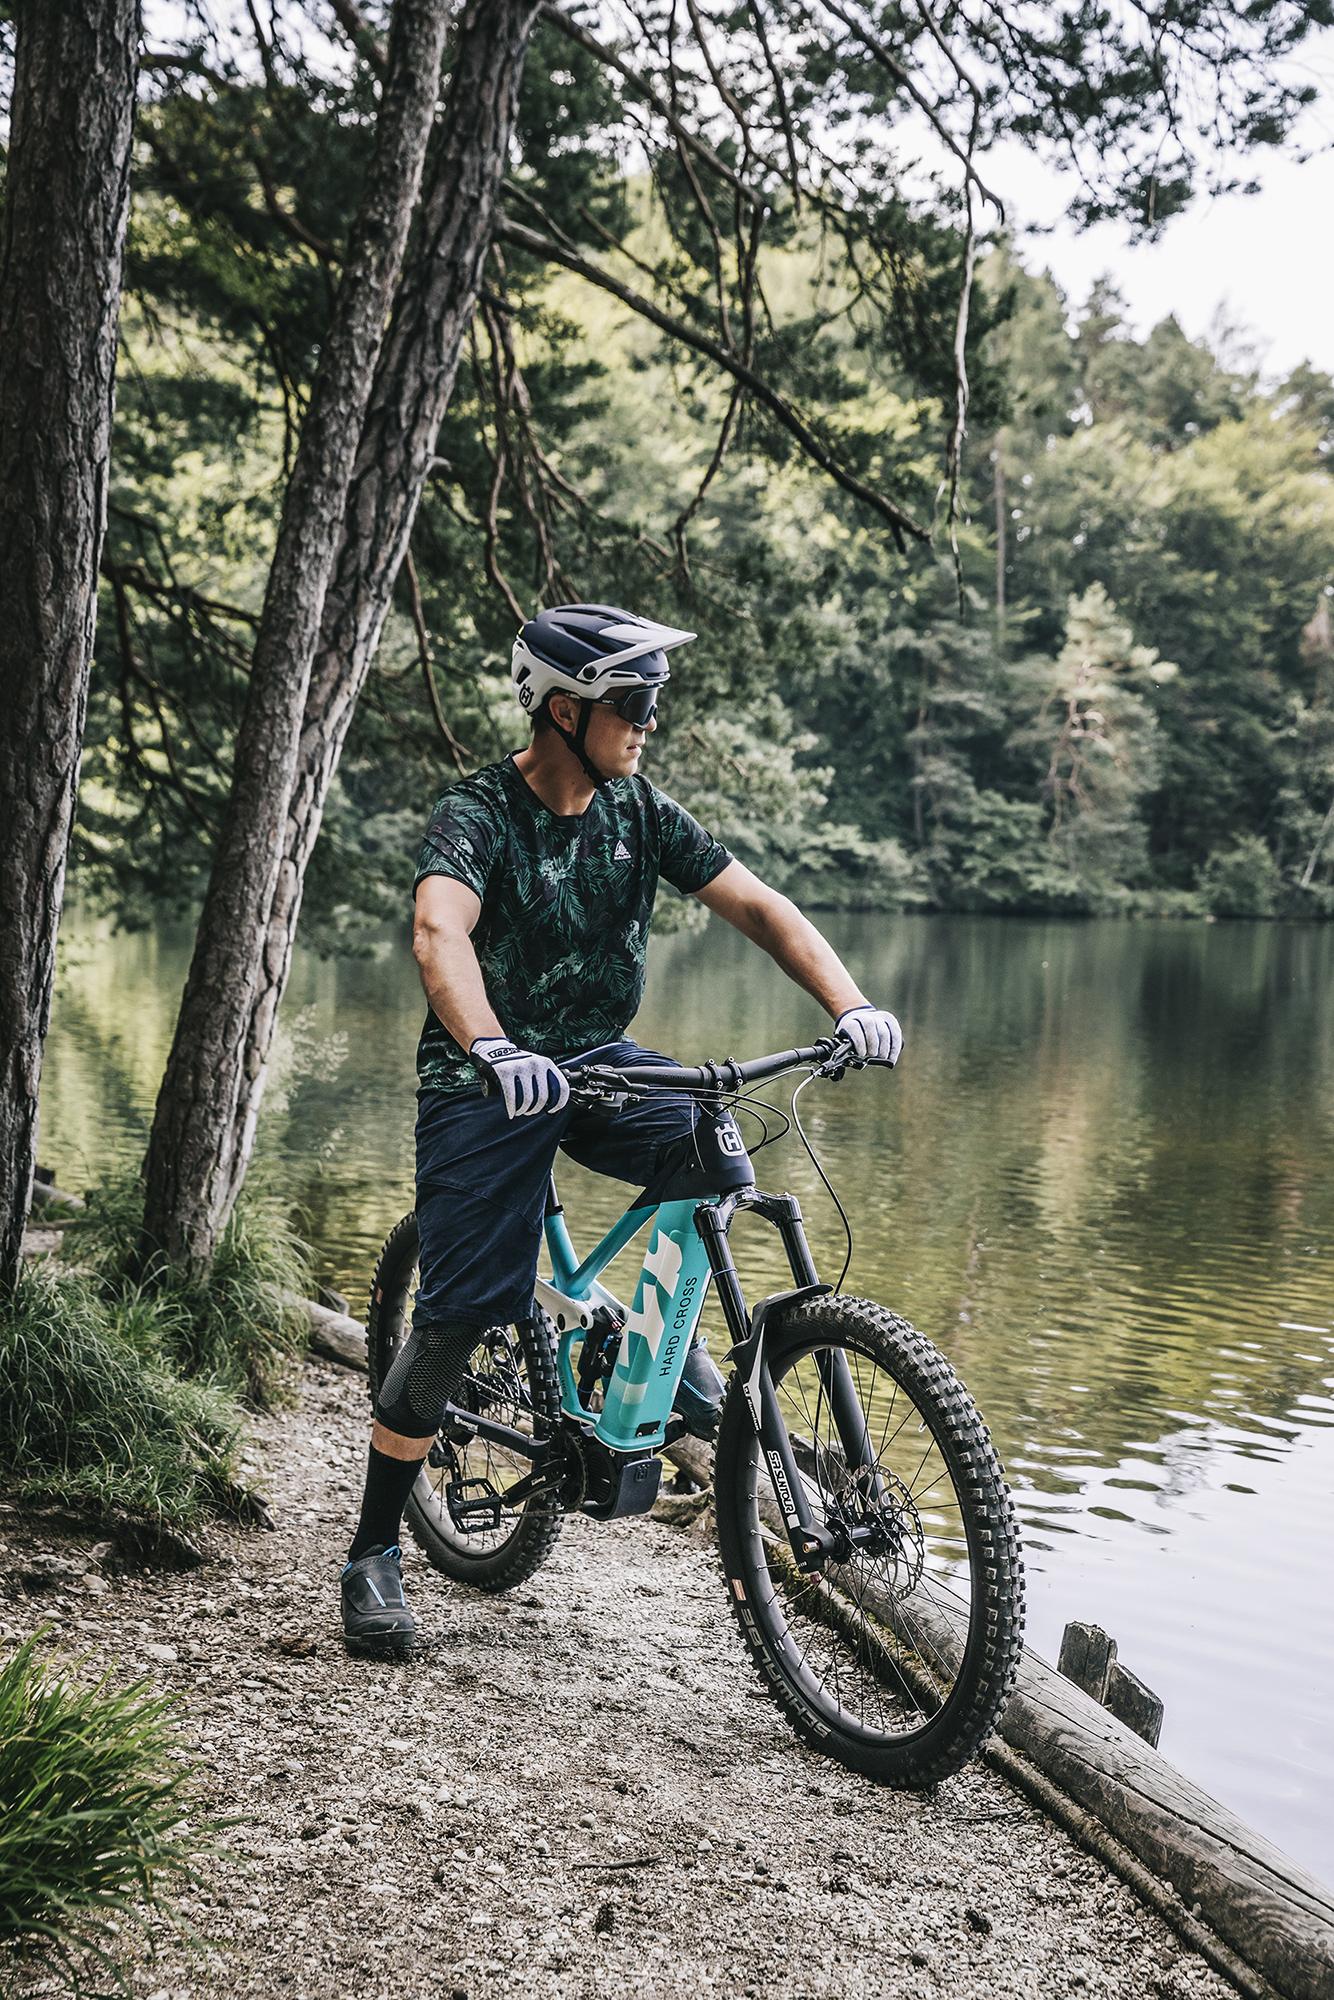 Natur erleben mit E-Bikes